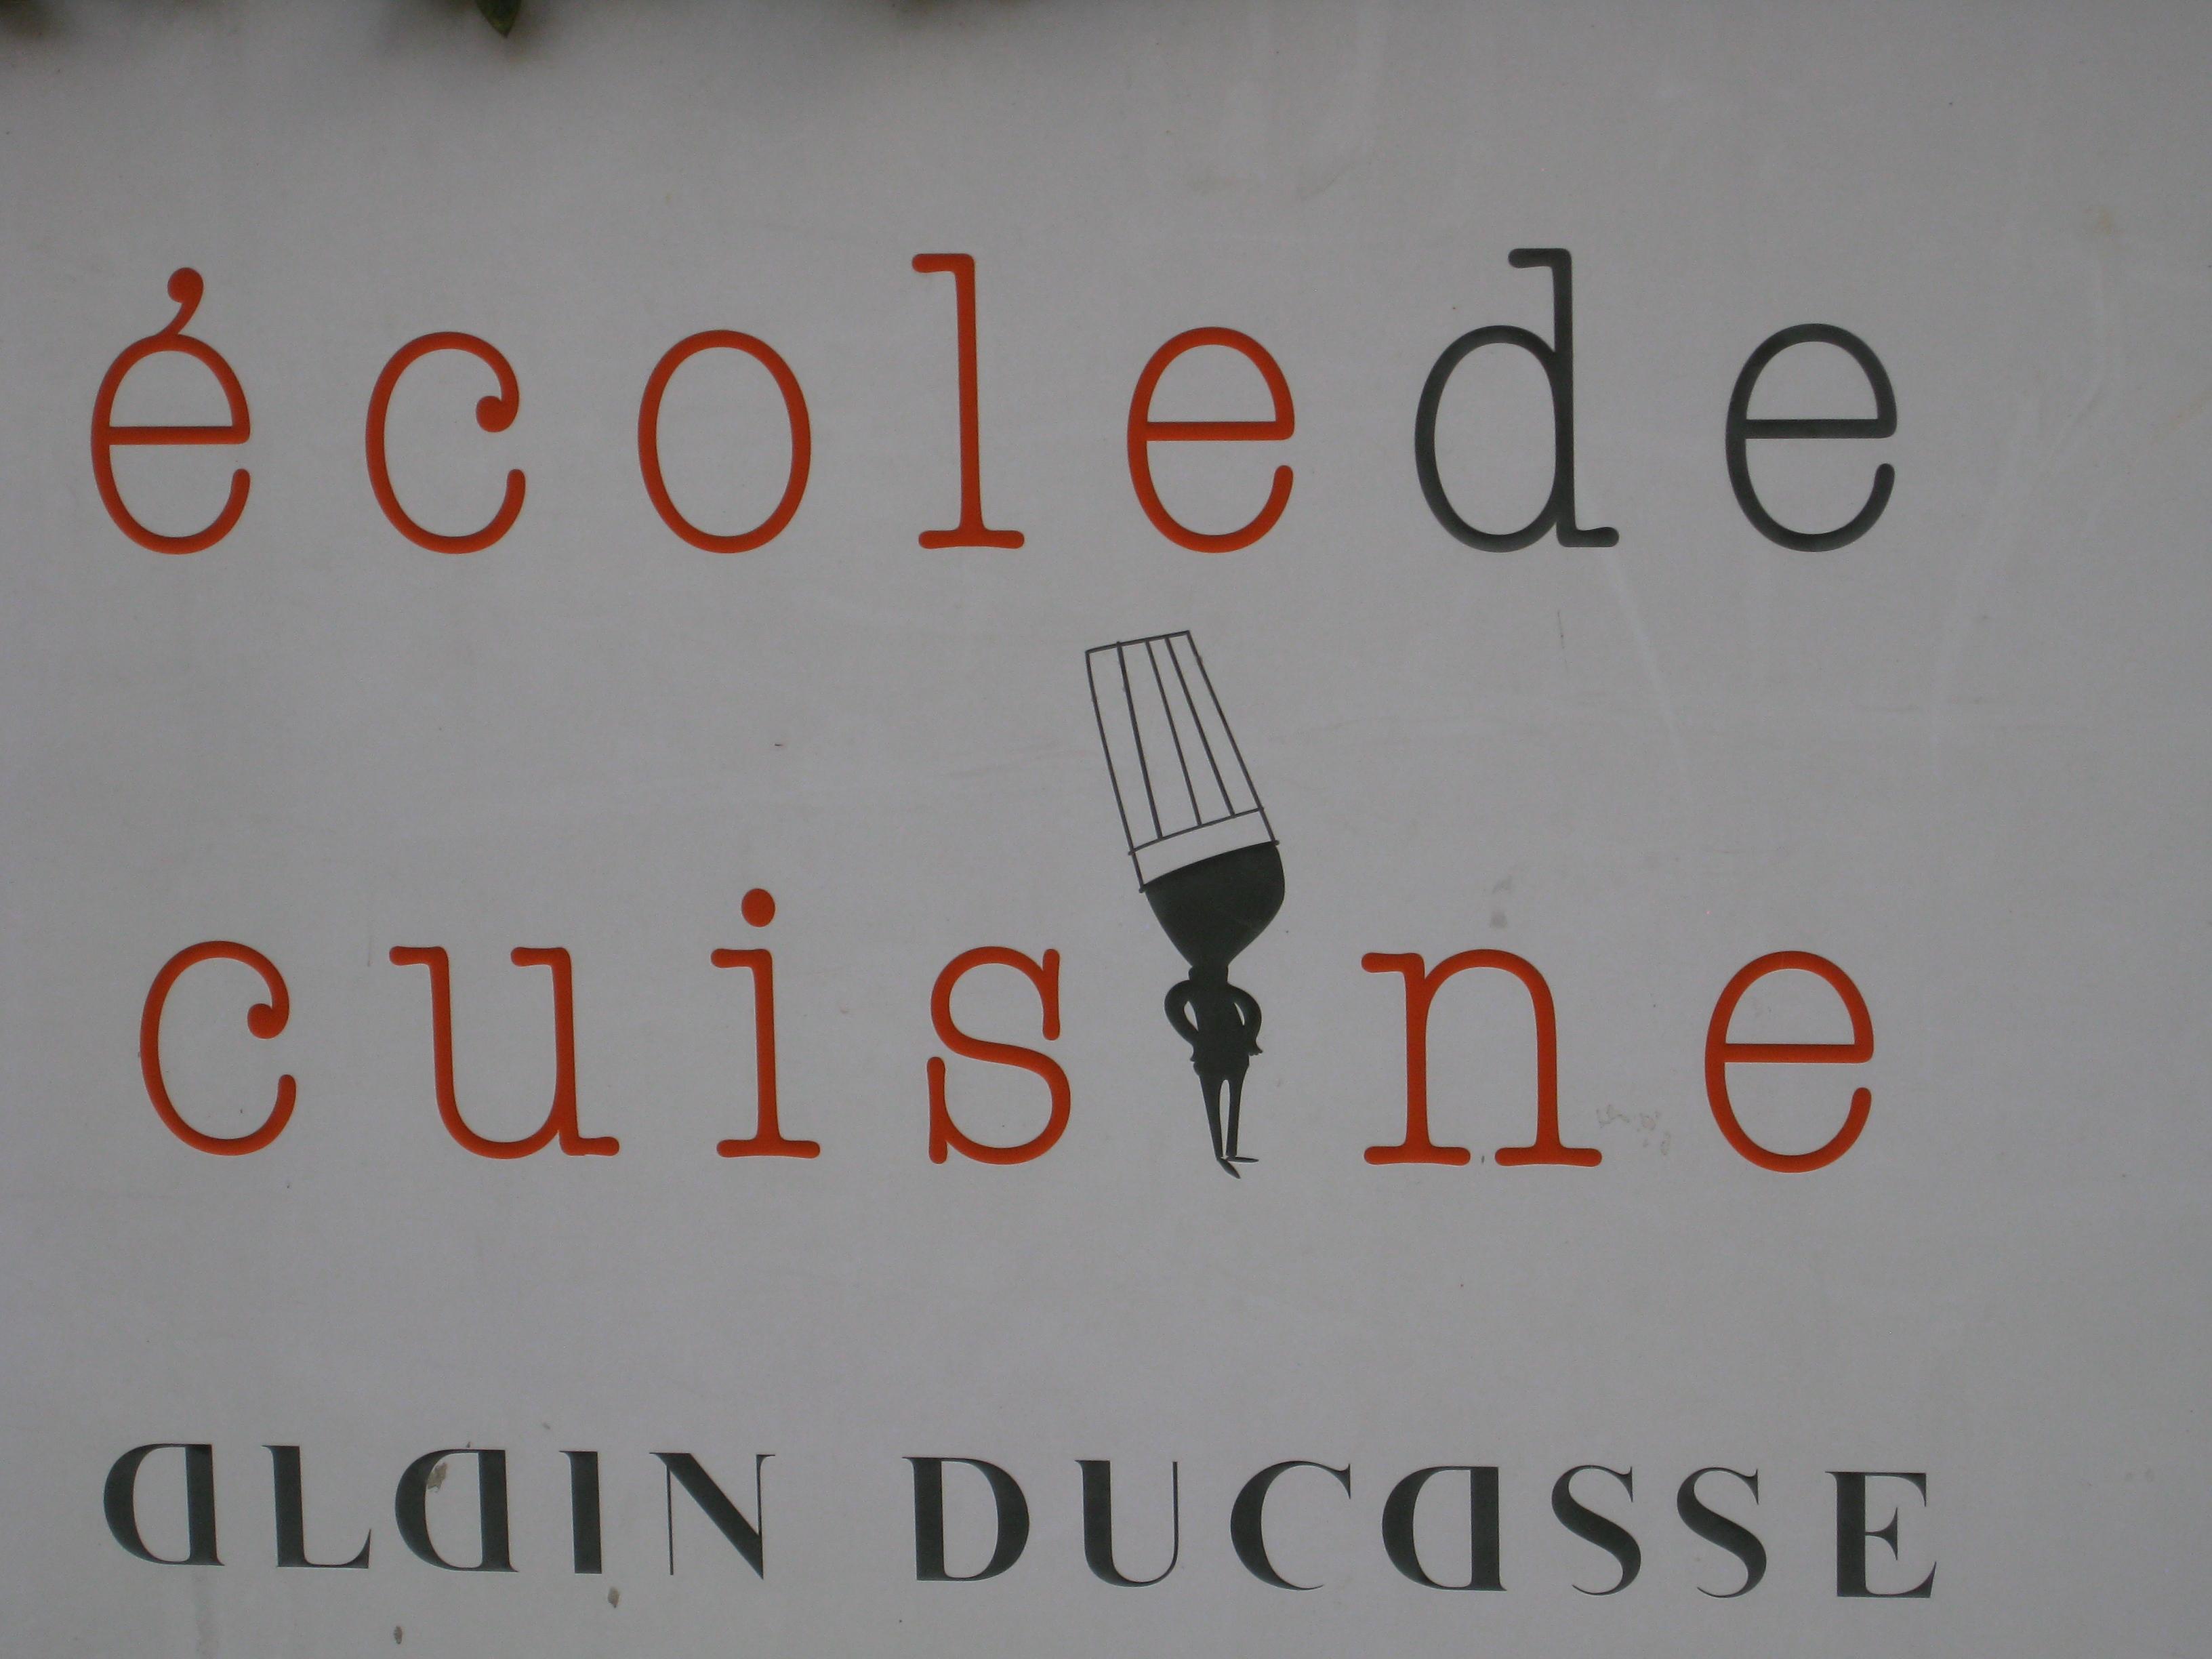 cole de cuisine alain ducasse delicious magazine. Black Bedroom Furniture Sets. Home Design Ideas